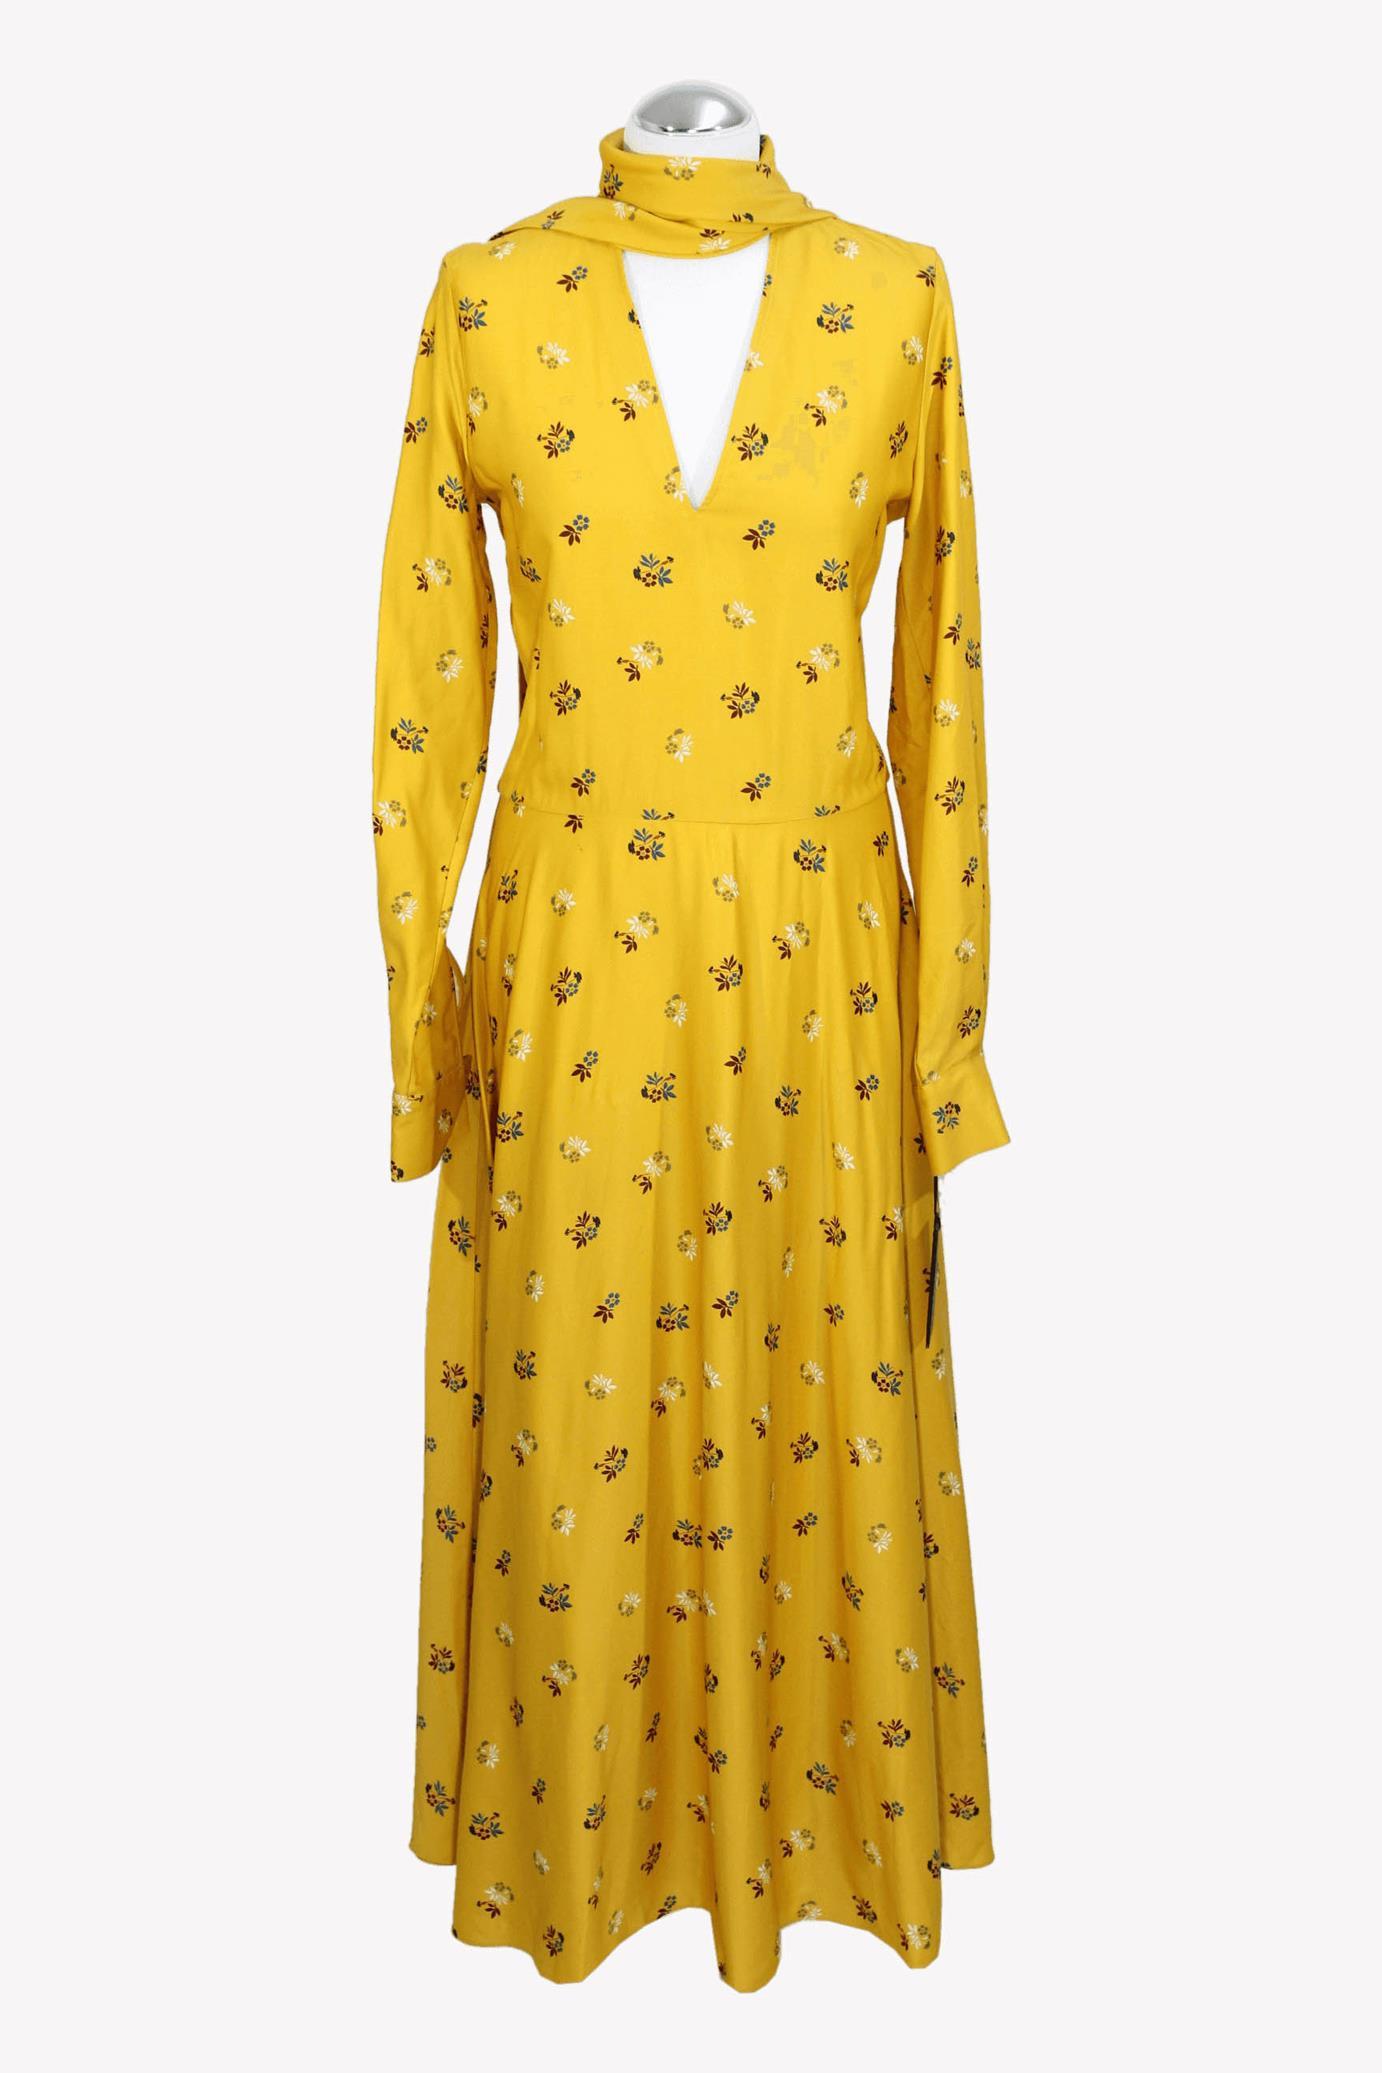 Mulberry Kleid in Gelb aus AG10434 AG10434.1